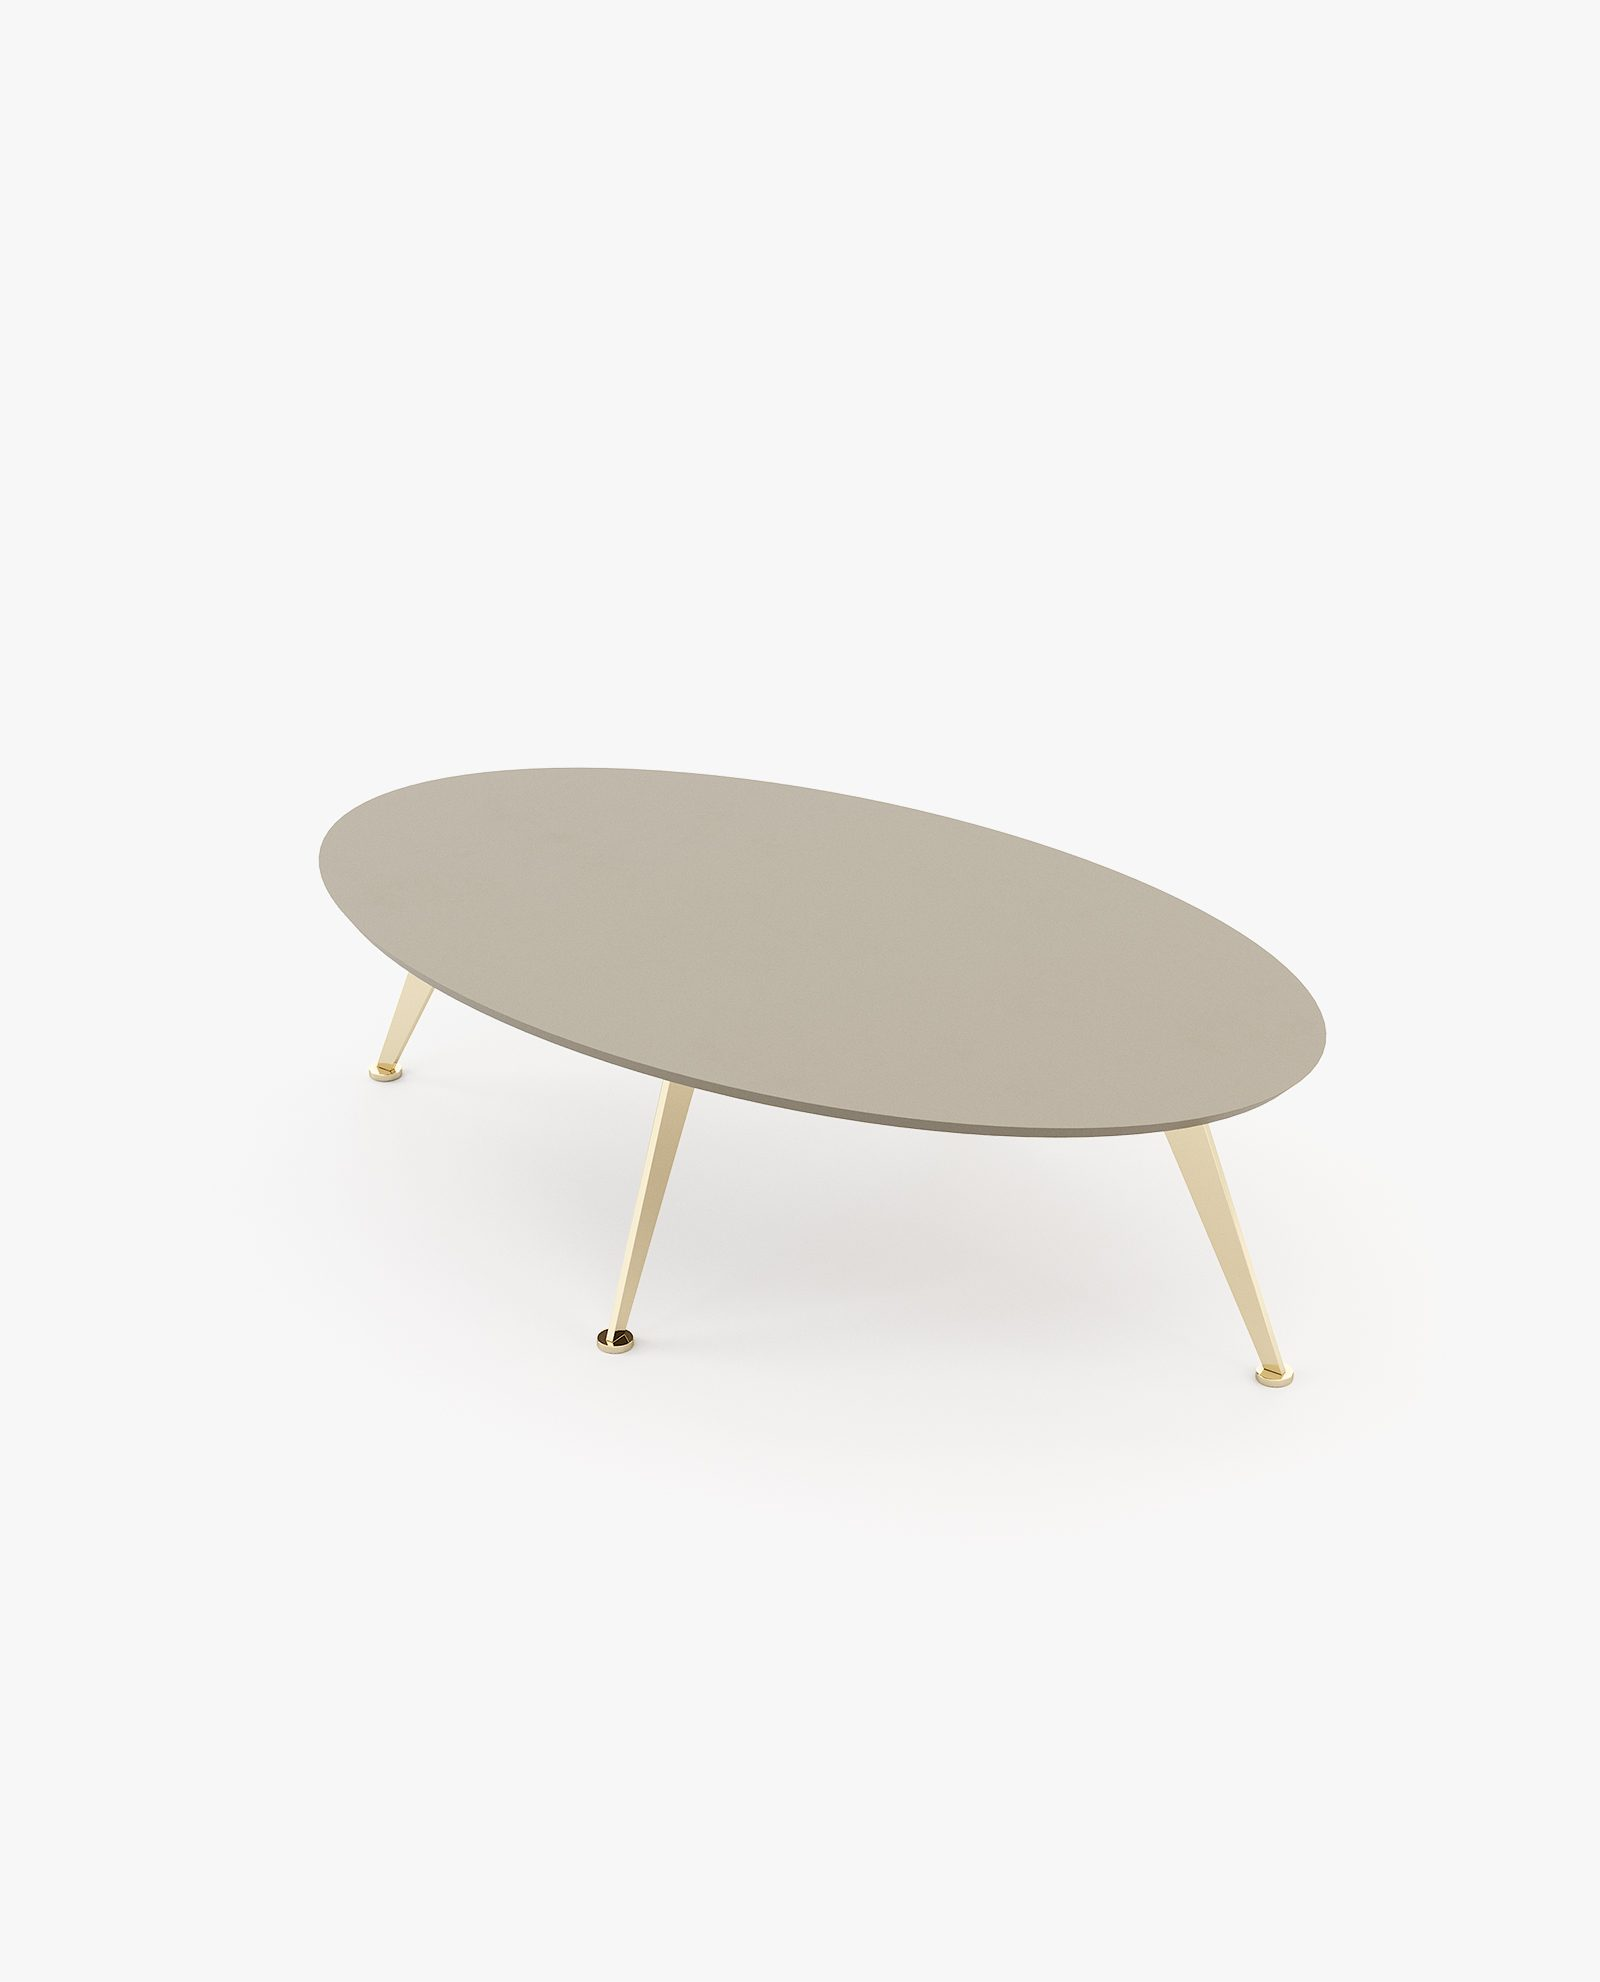 mesa de centro lacada a cinza com inox dourado